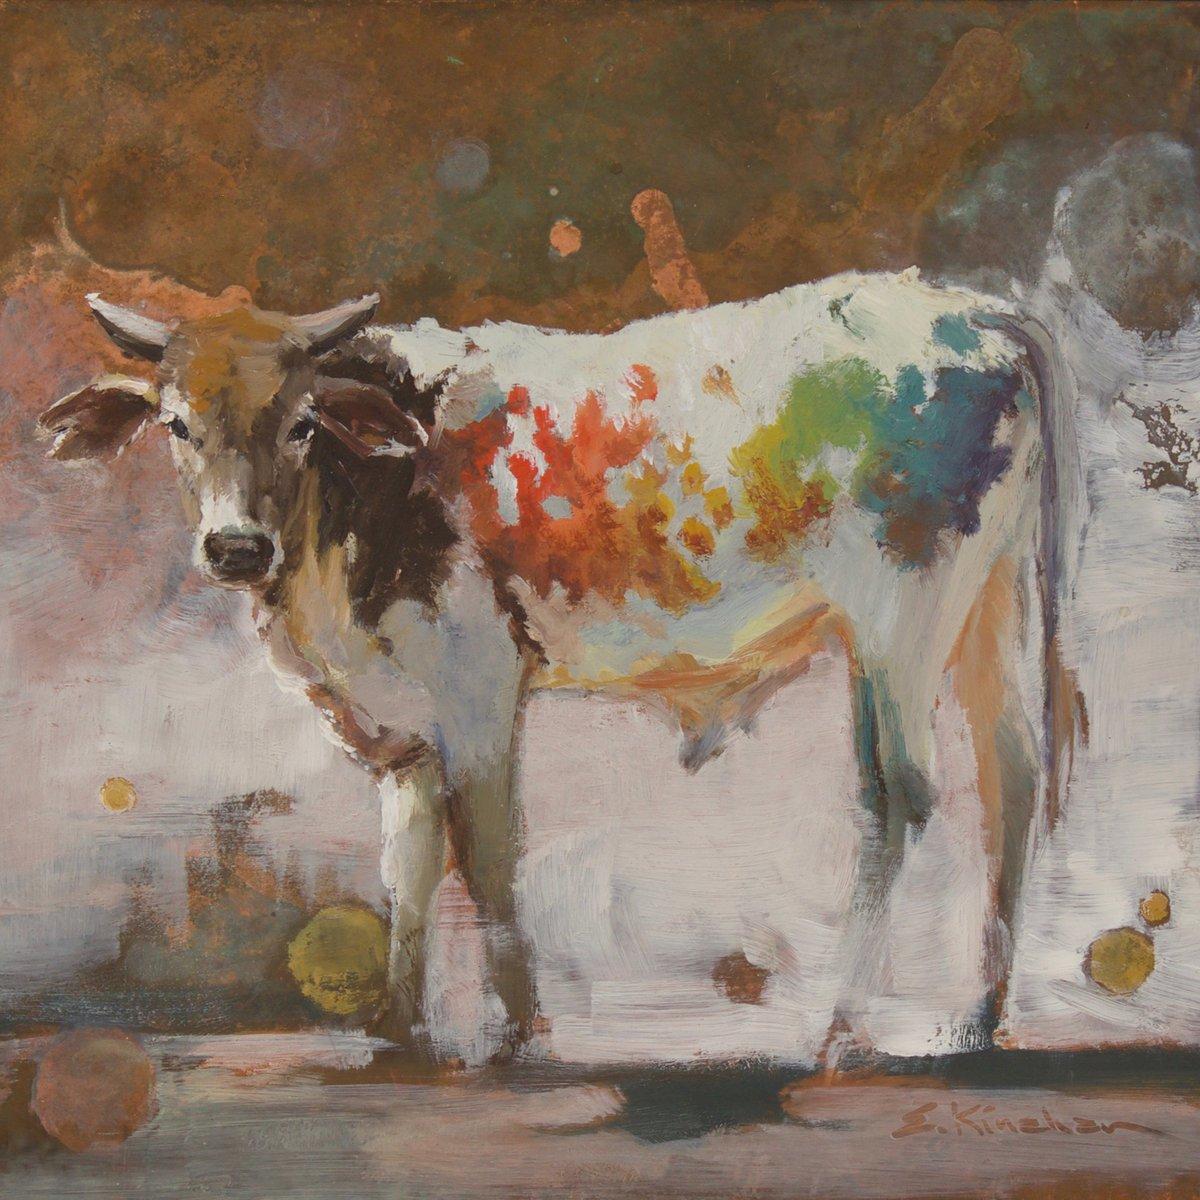 Image of super rainbow unicorn baby love bull prints